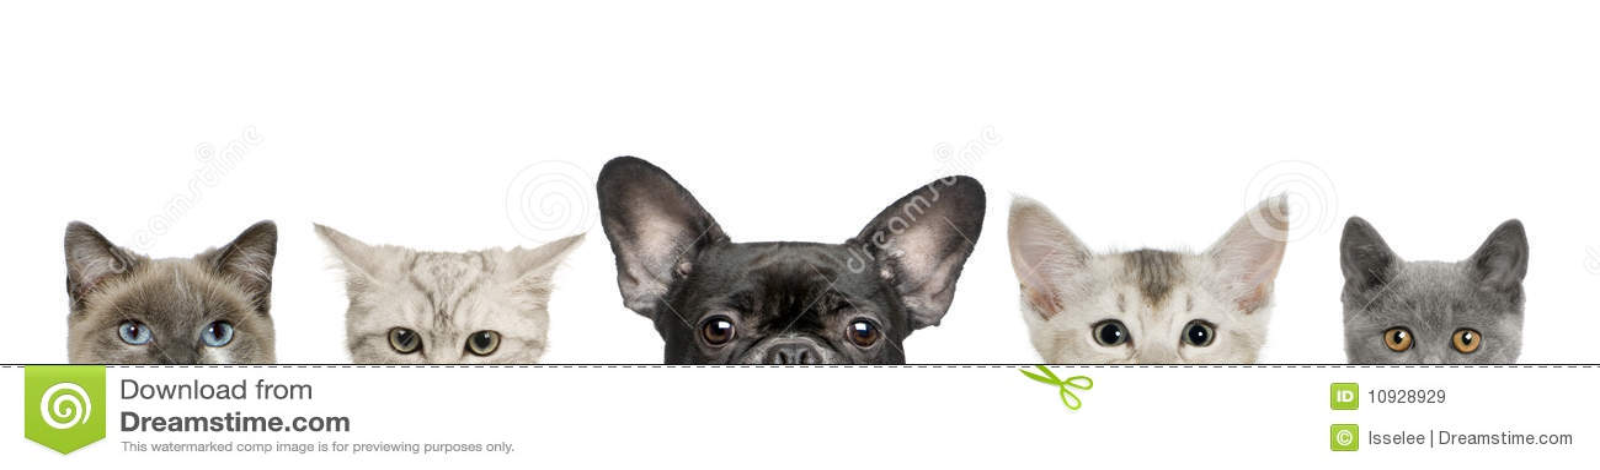 Hundekopf- und -katzeköpfe